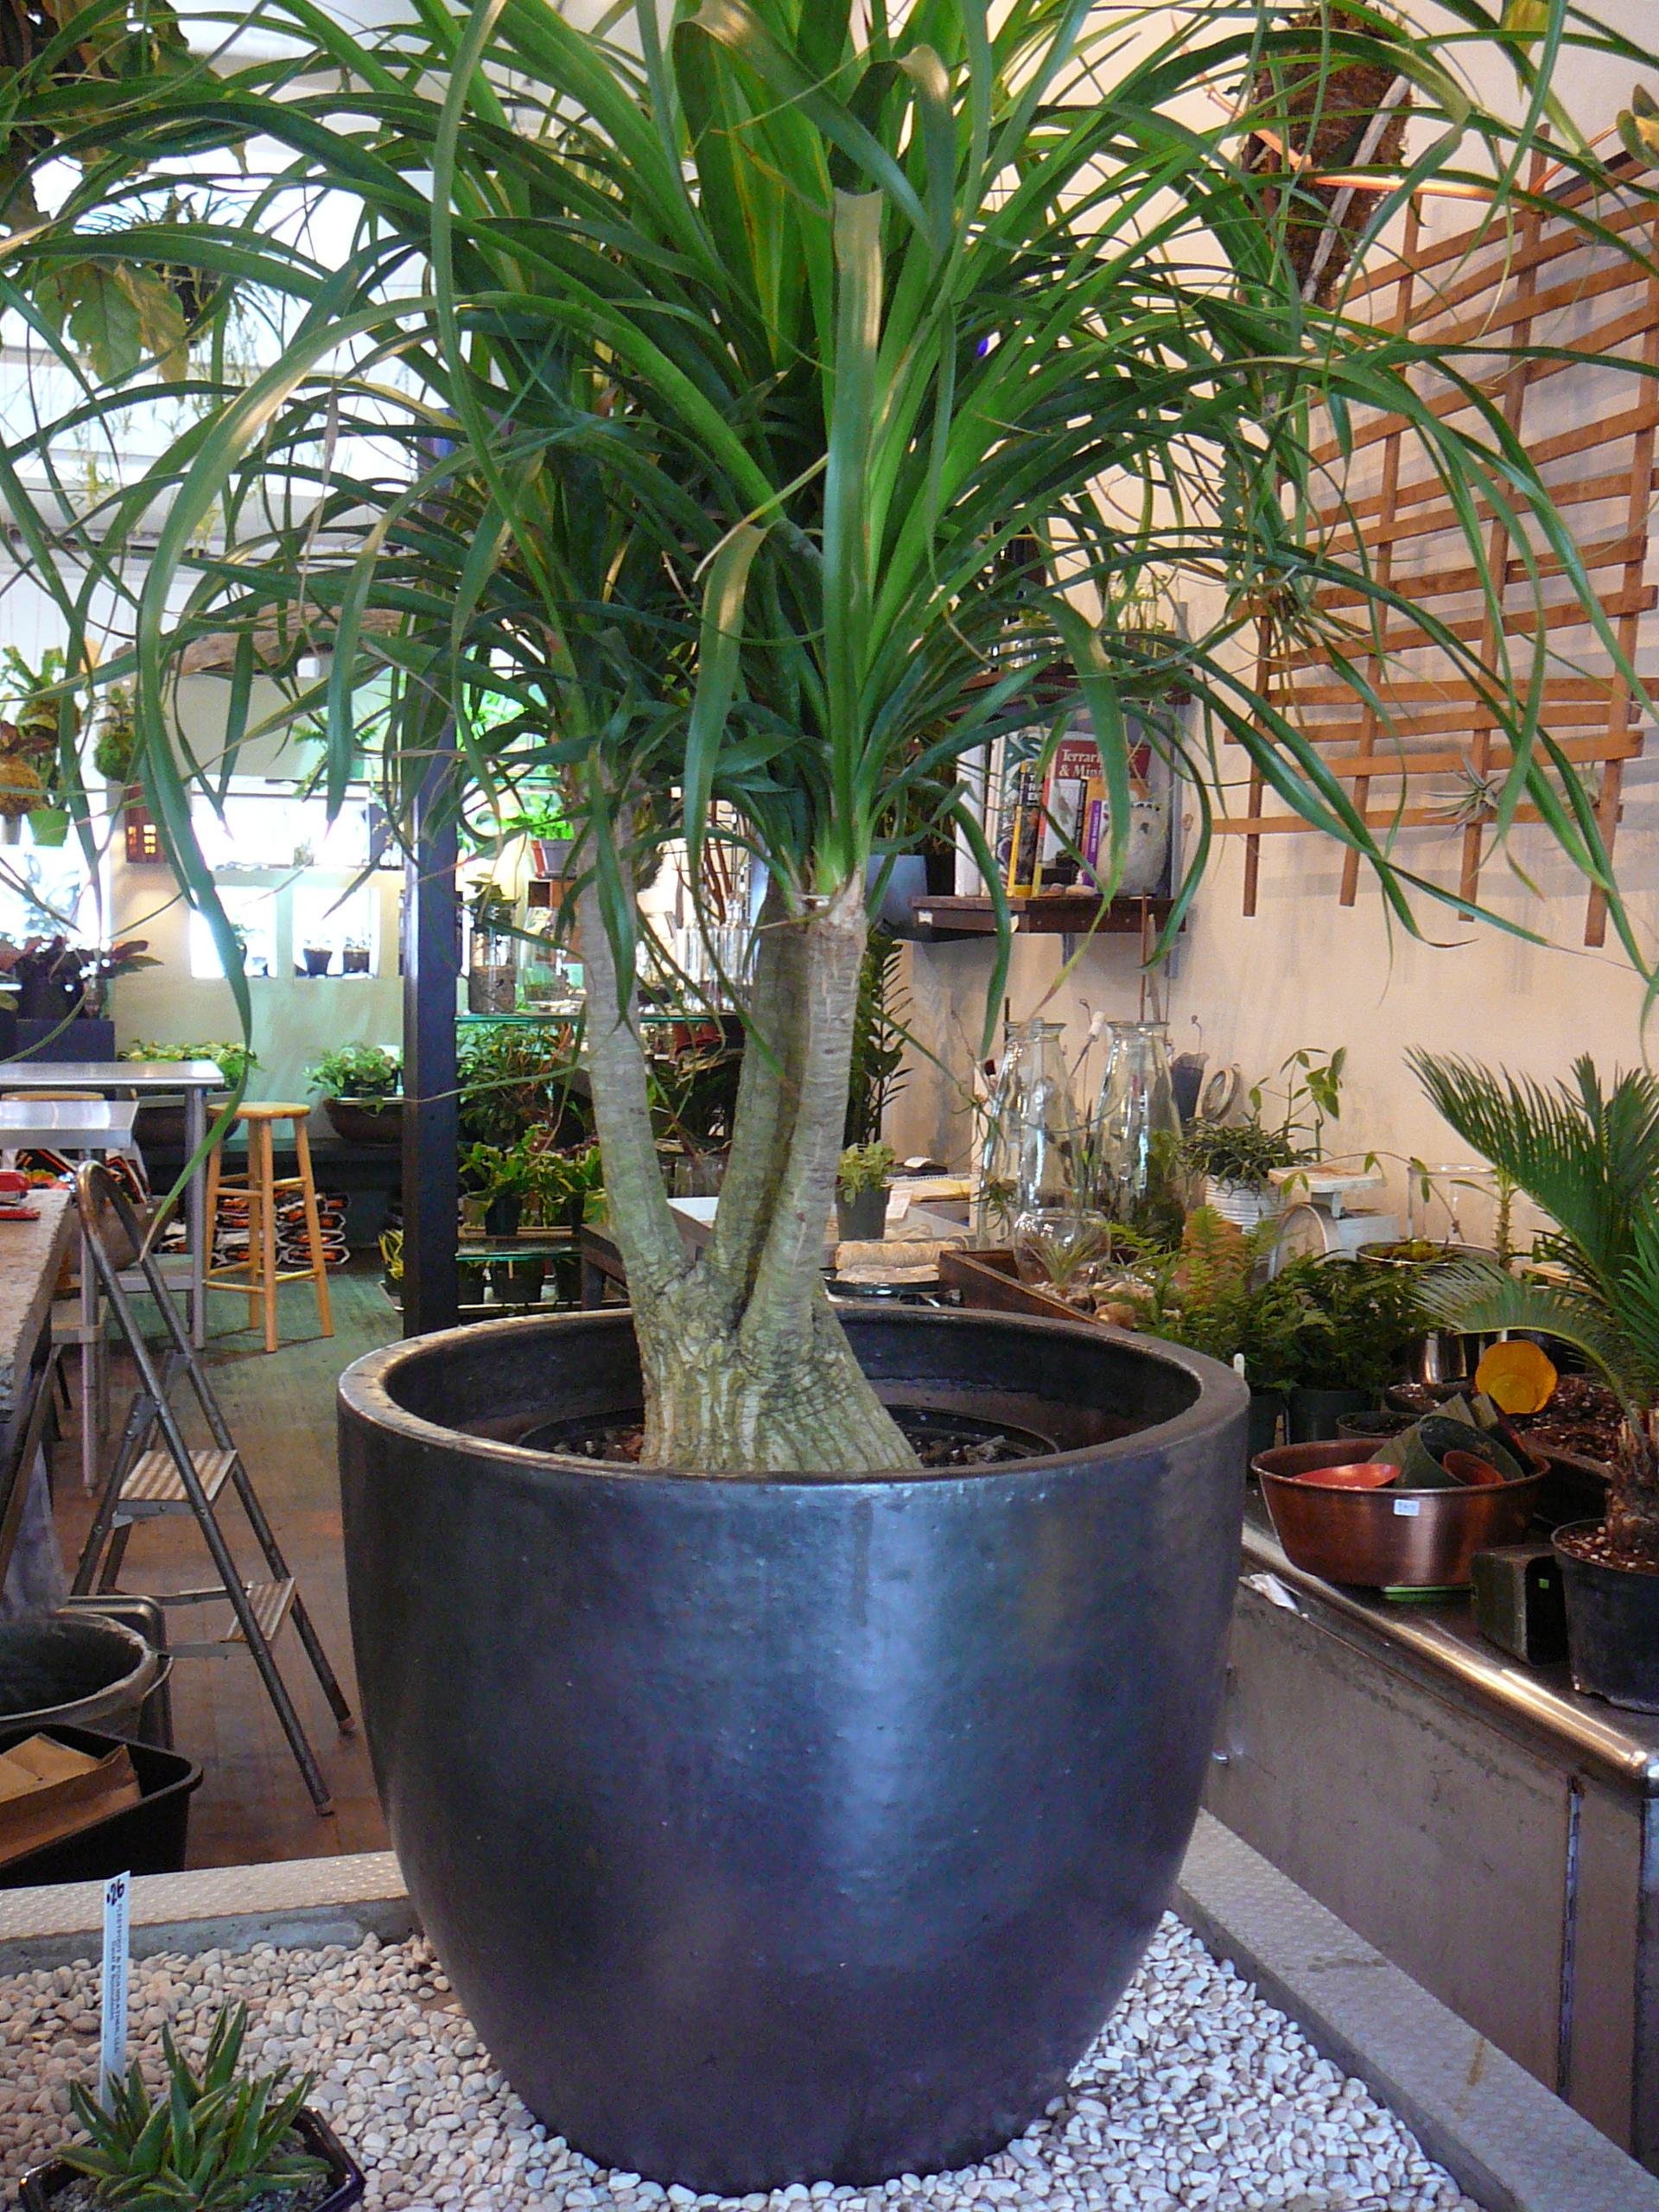 Senecio Rowleyanus Hngepflanzen Frs Zimmer 22 Hngende